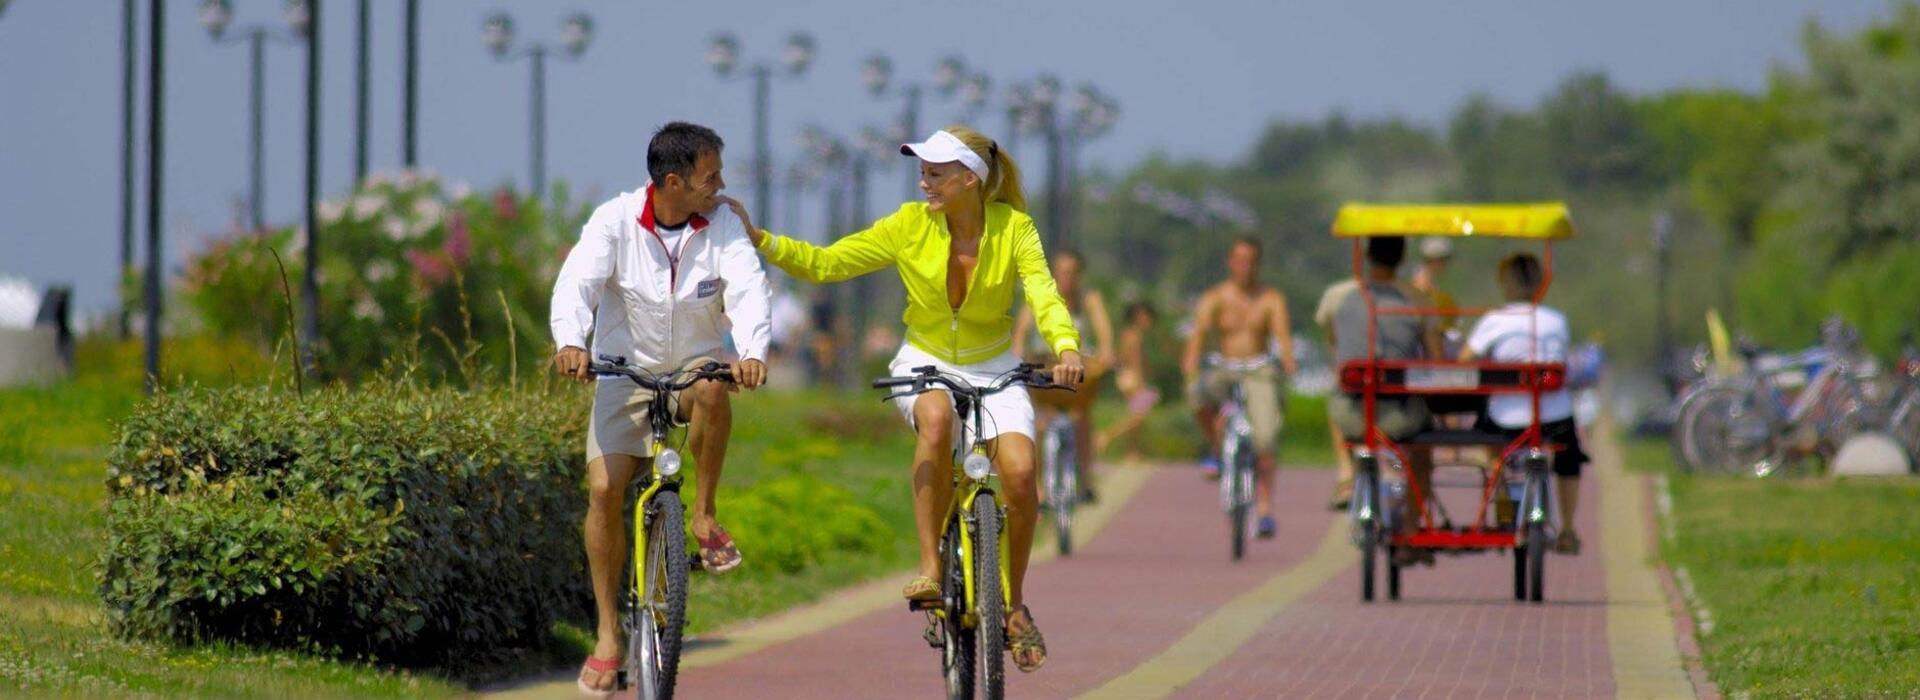 hotelvictoria de bike-hotel 015